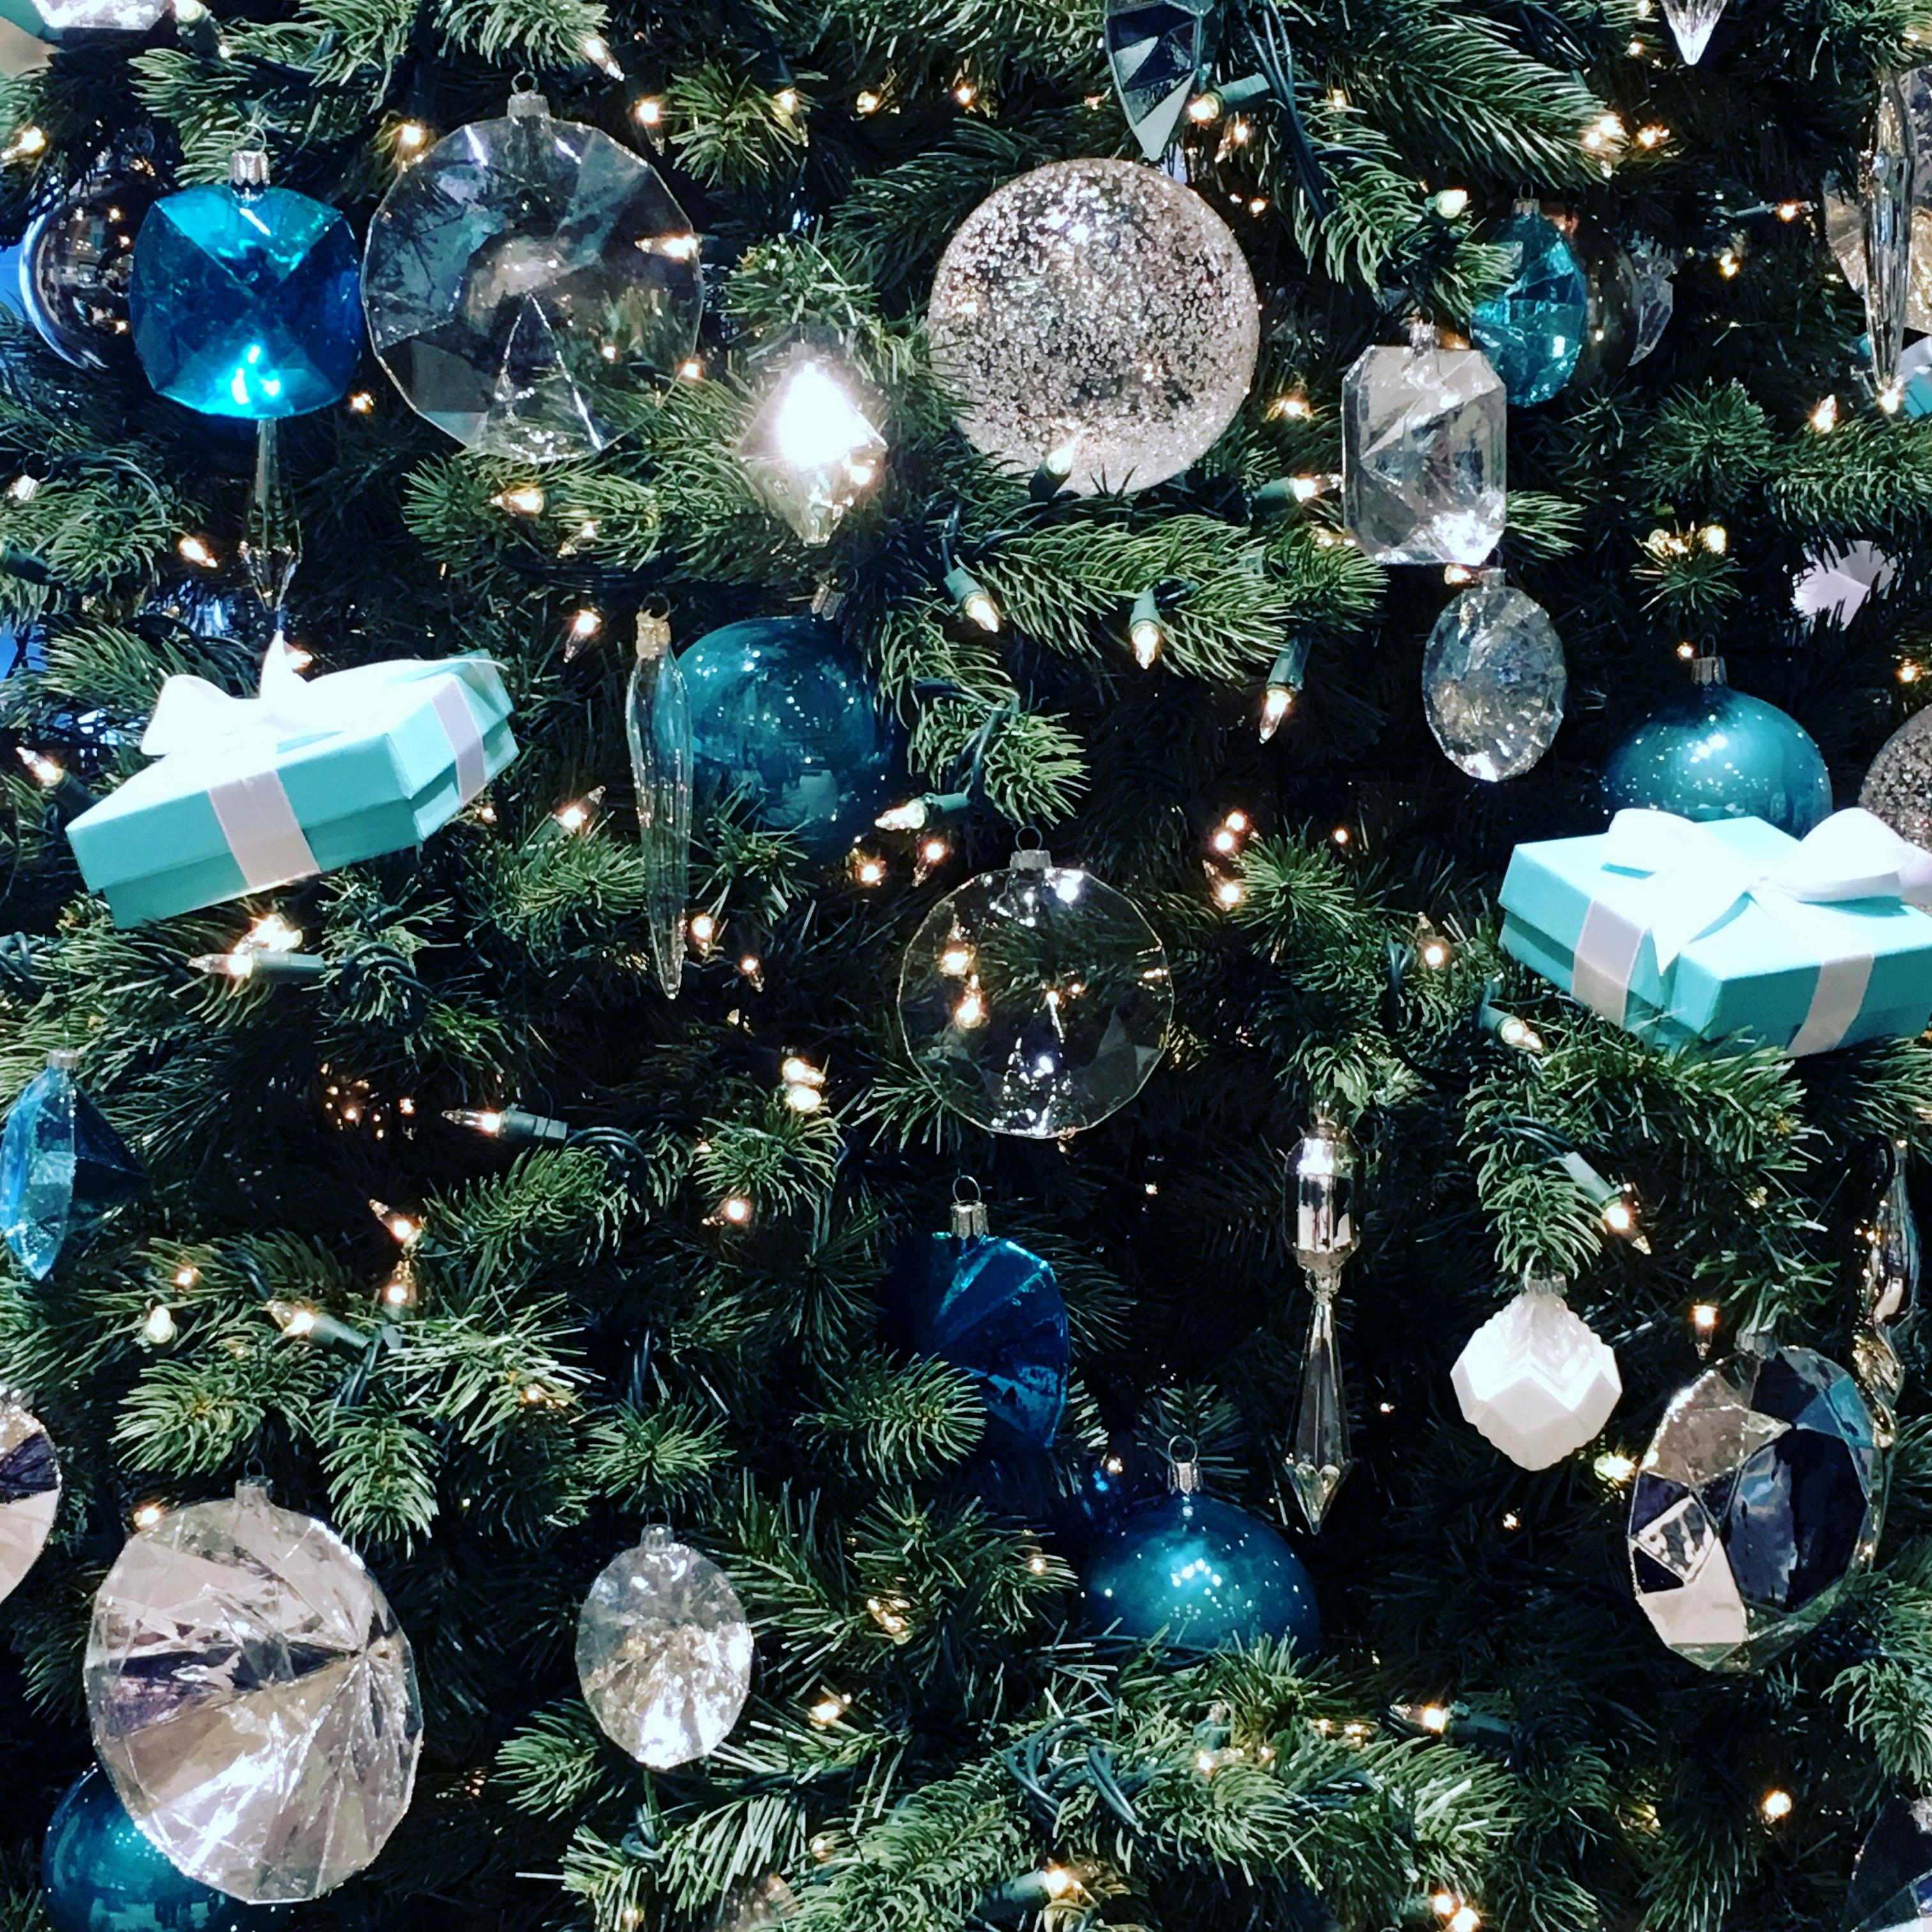 Tiffany And Co Christmas Ornaments Part - 20: ... 2015 12 11 New York Tiffany U0026 Co Christmas Tree 2